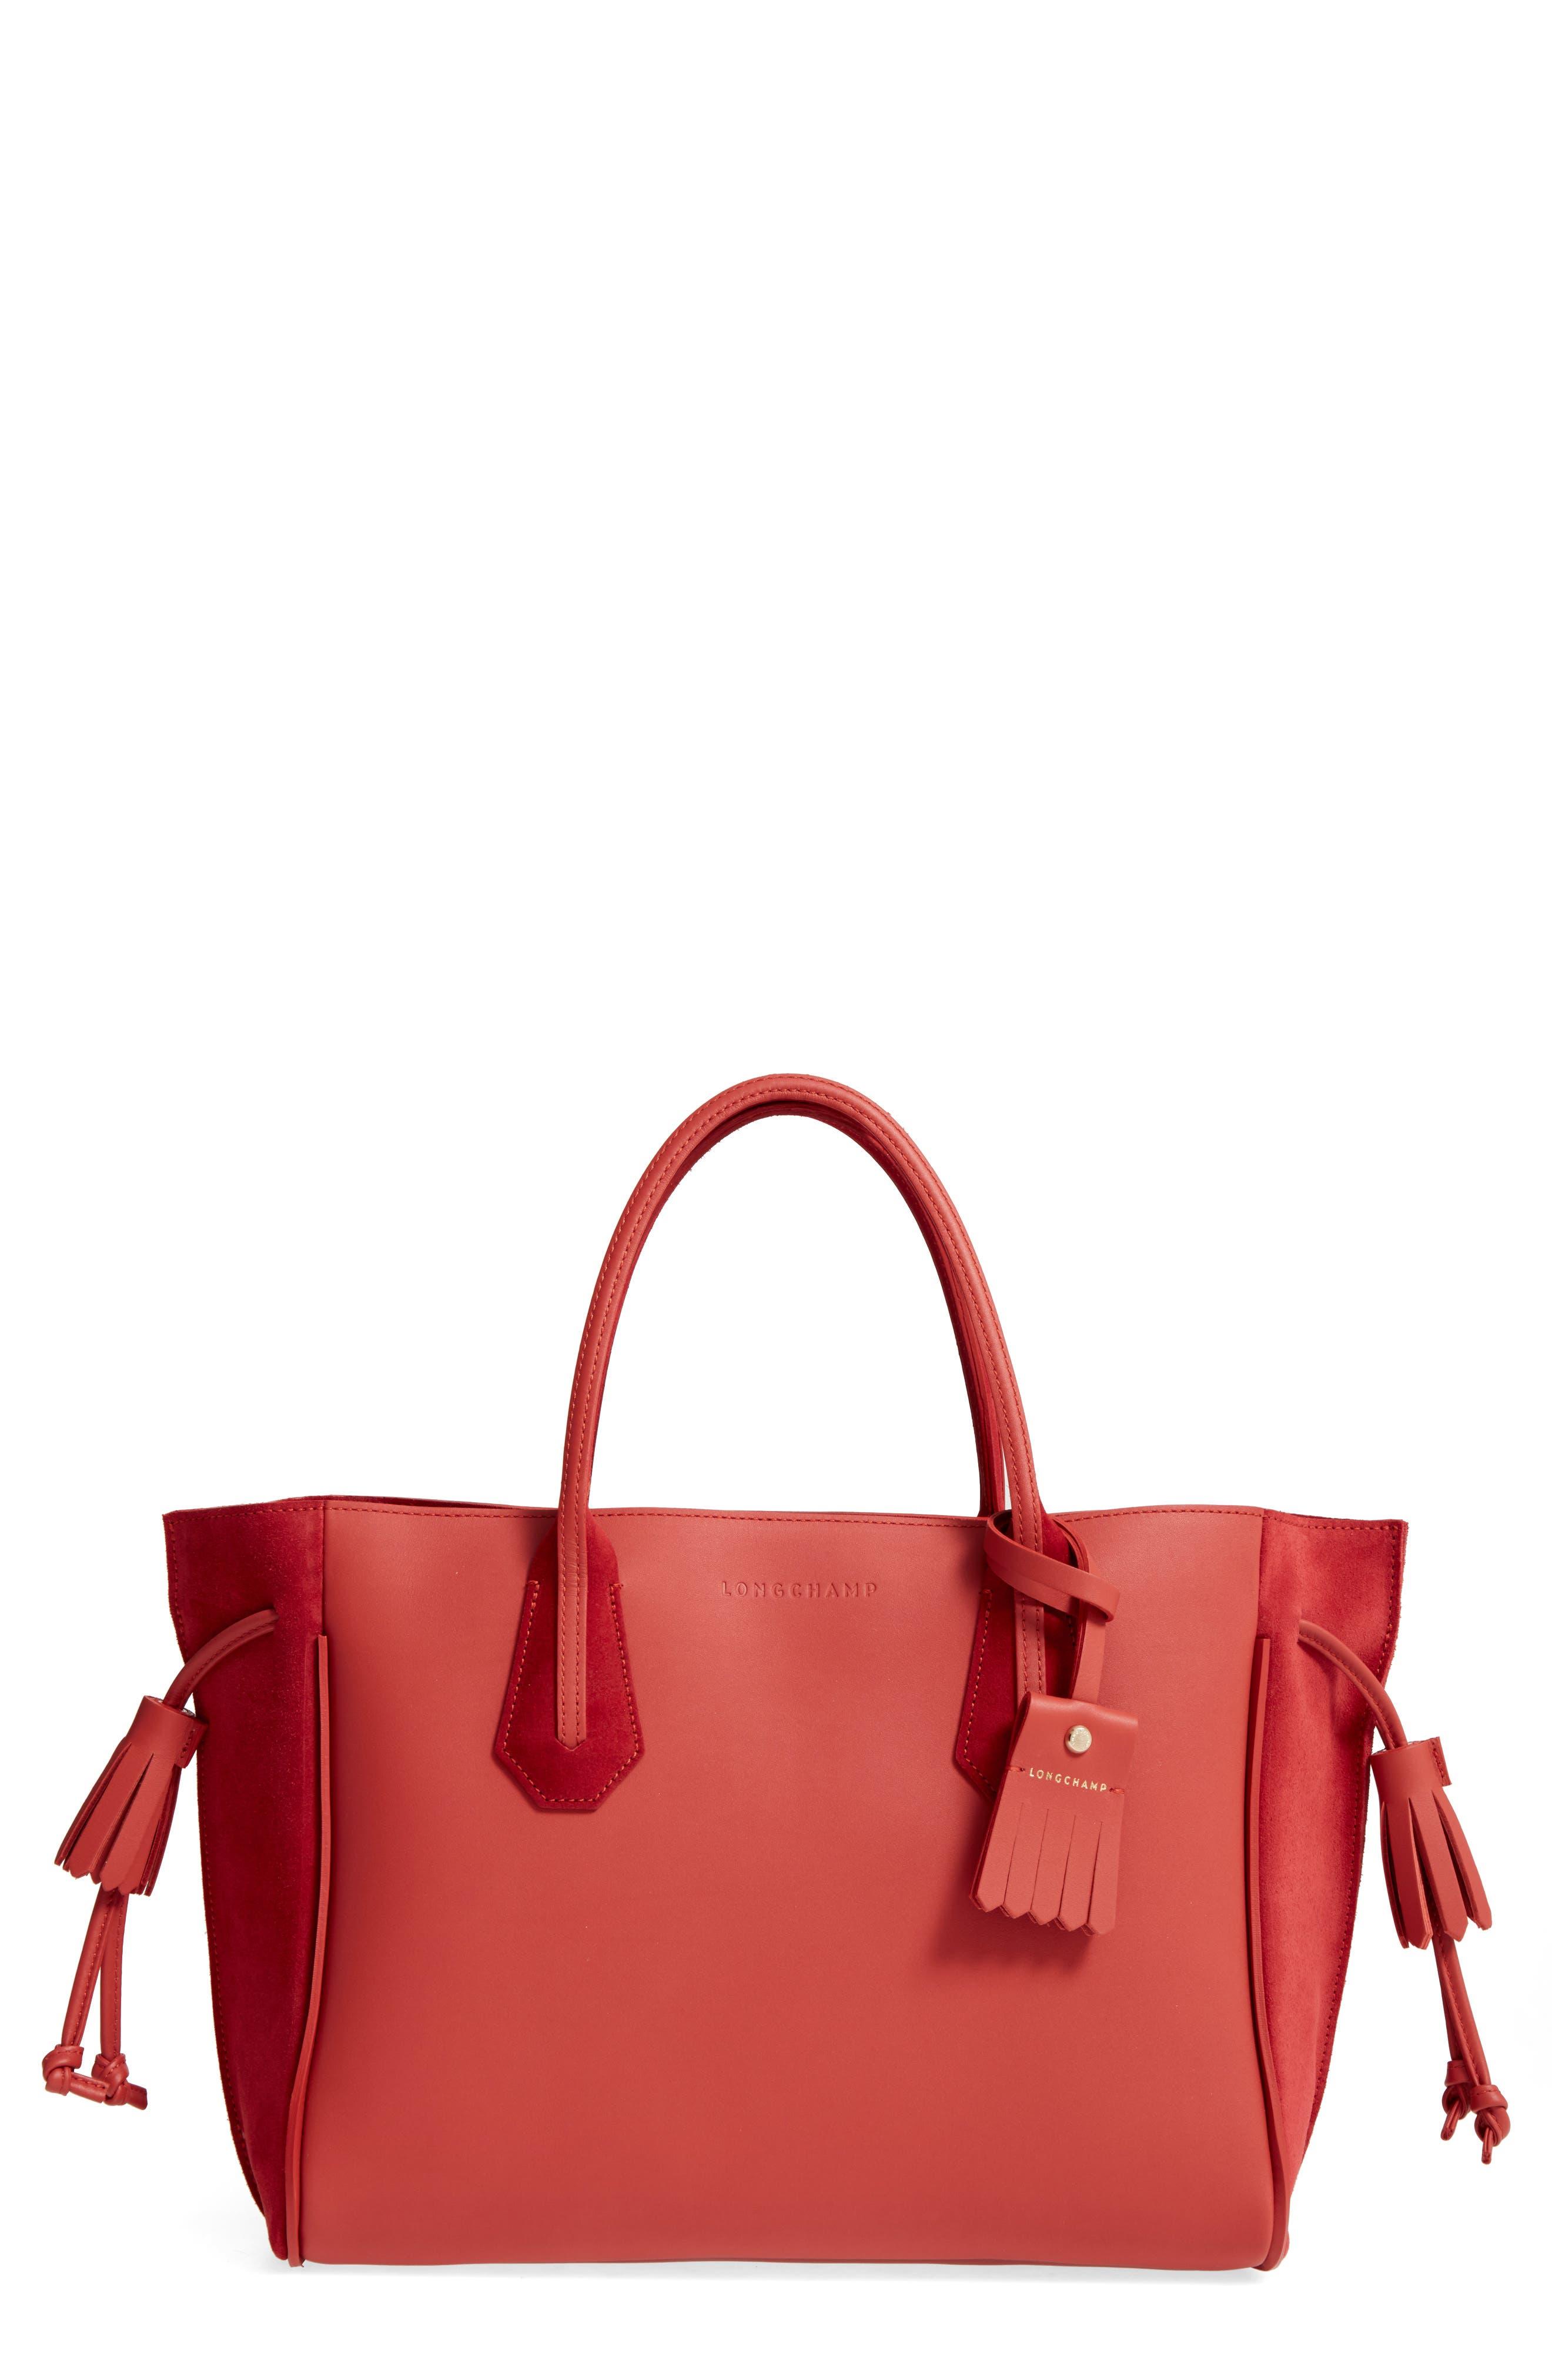 Main Image - Longchamp Medium Penelope Fastaisie Leather Tote